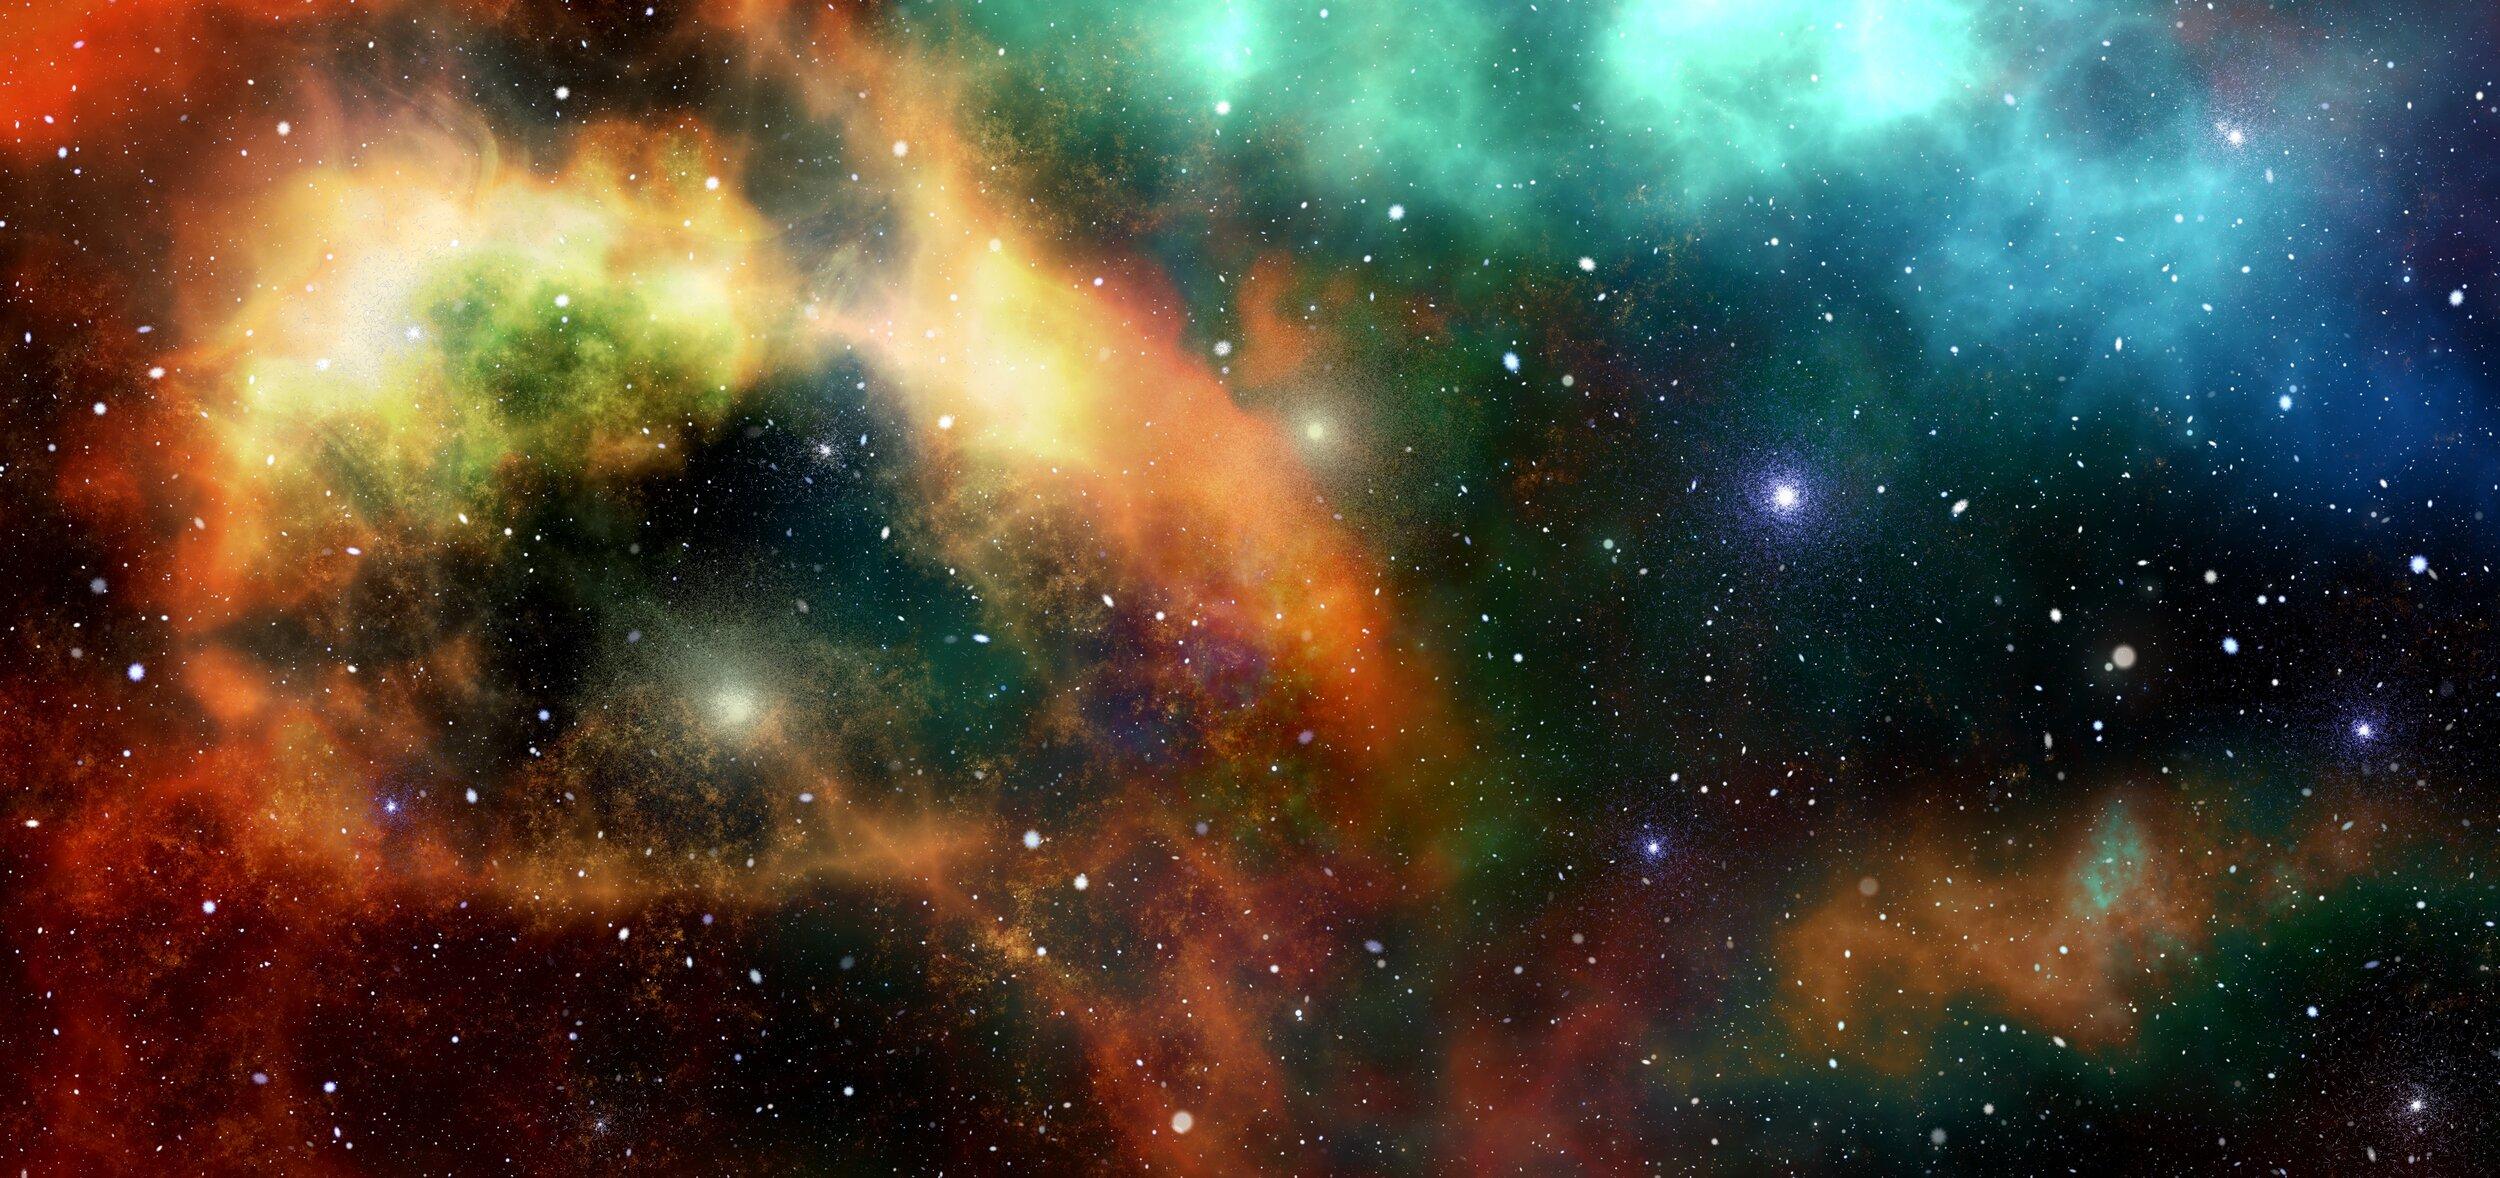 universe-2742113.jpg